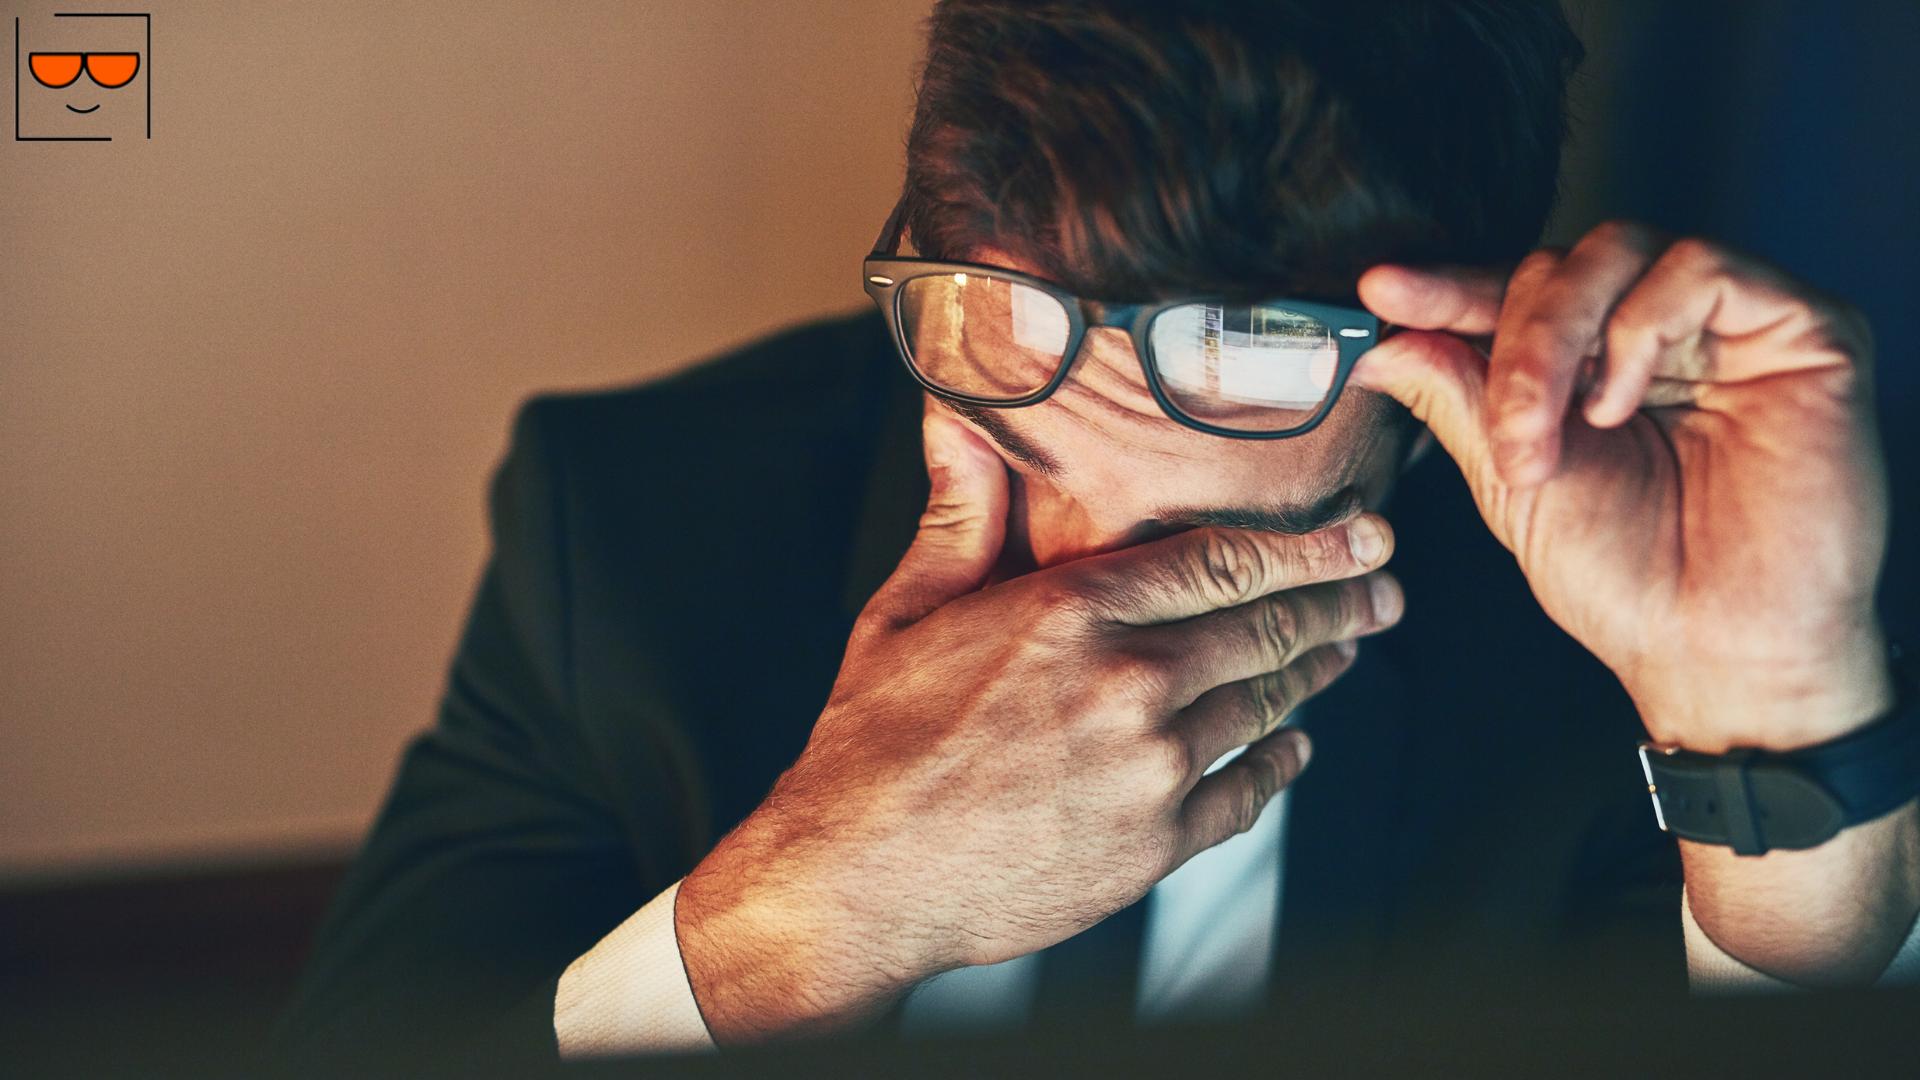 Man rubbing eyes due to eye strain